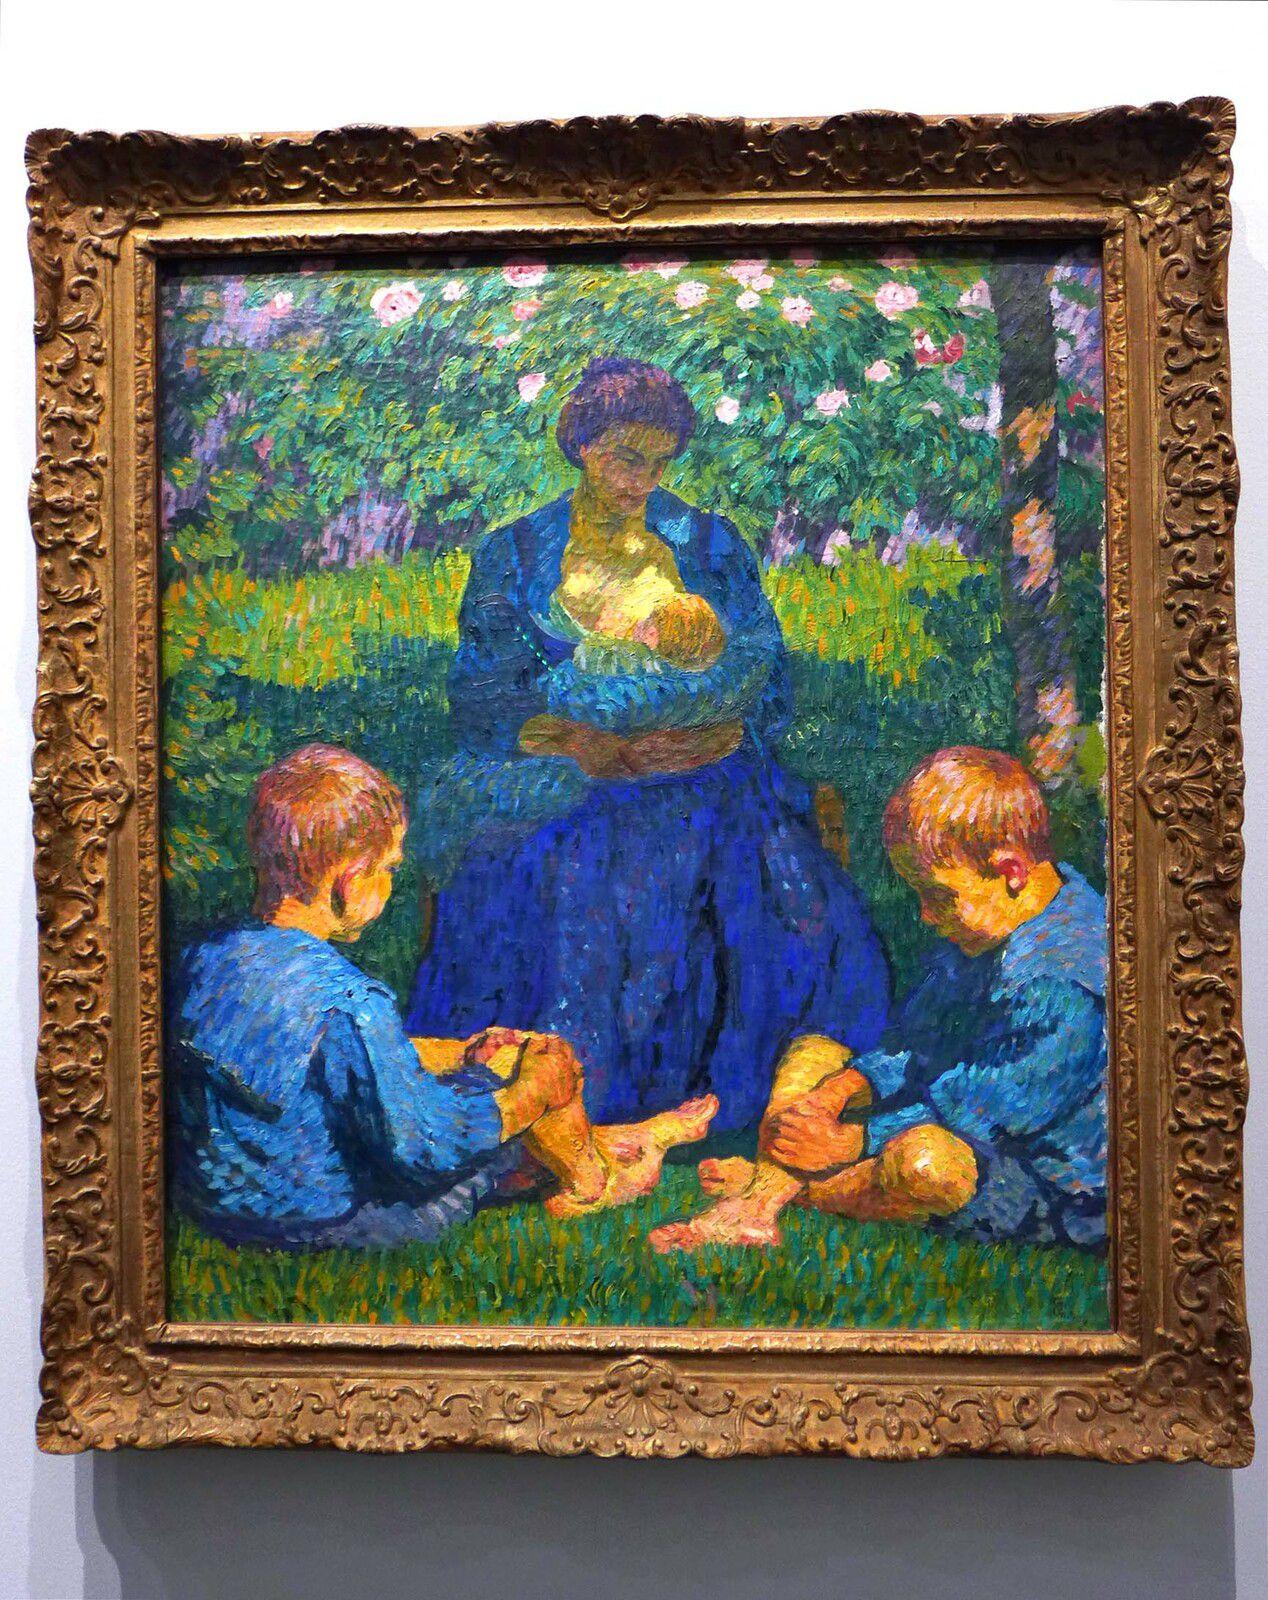 Giovanni GIACOMETTI, Maternité (1908), huile sur toile. Suisse, collection Dr. Blocher.